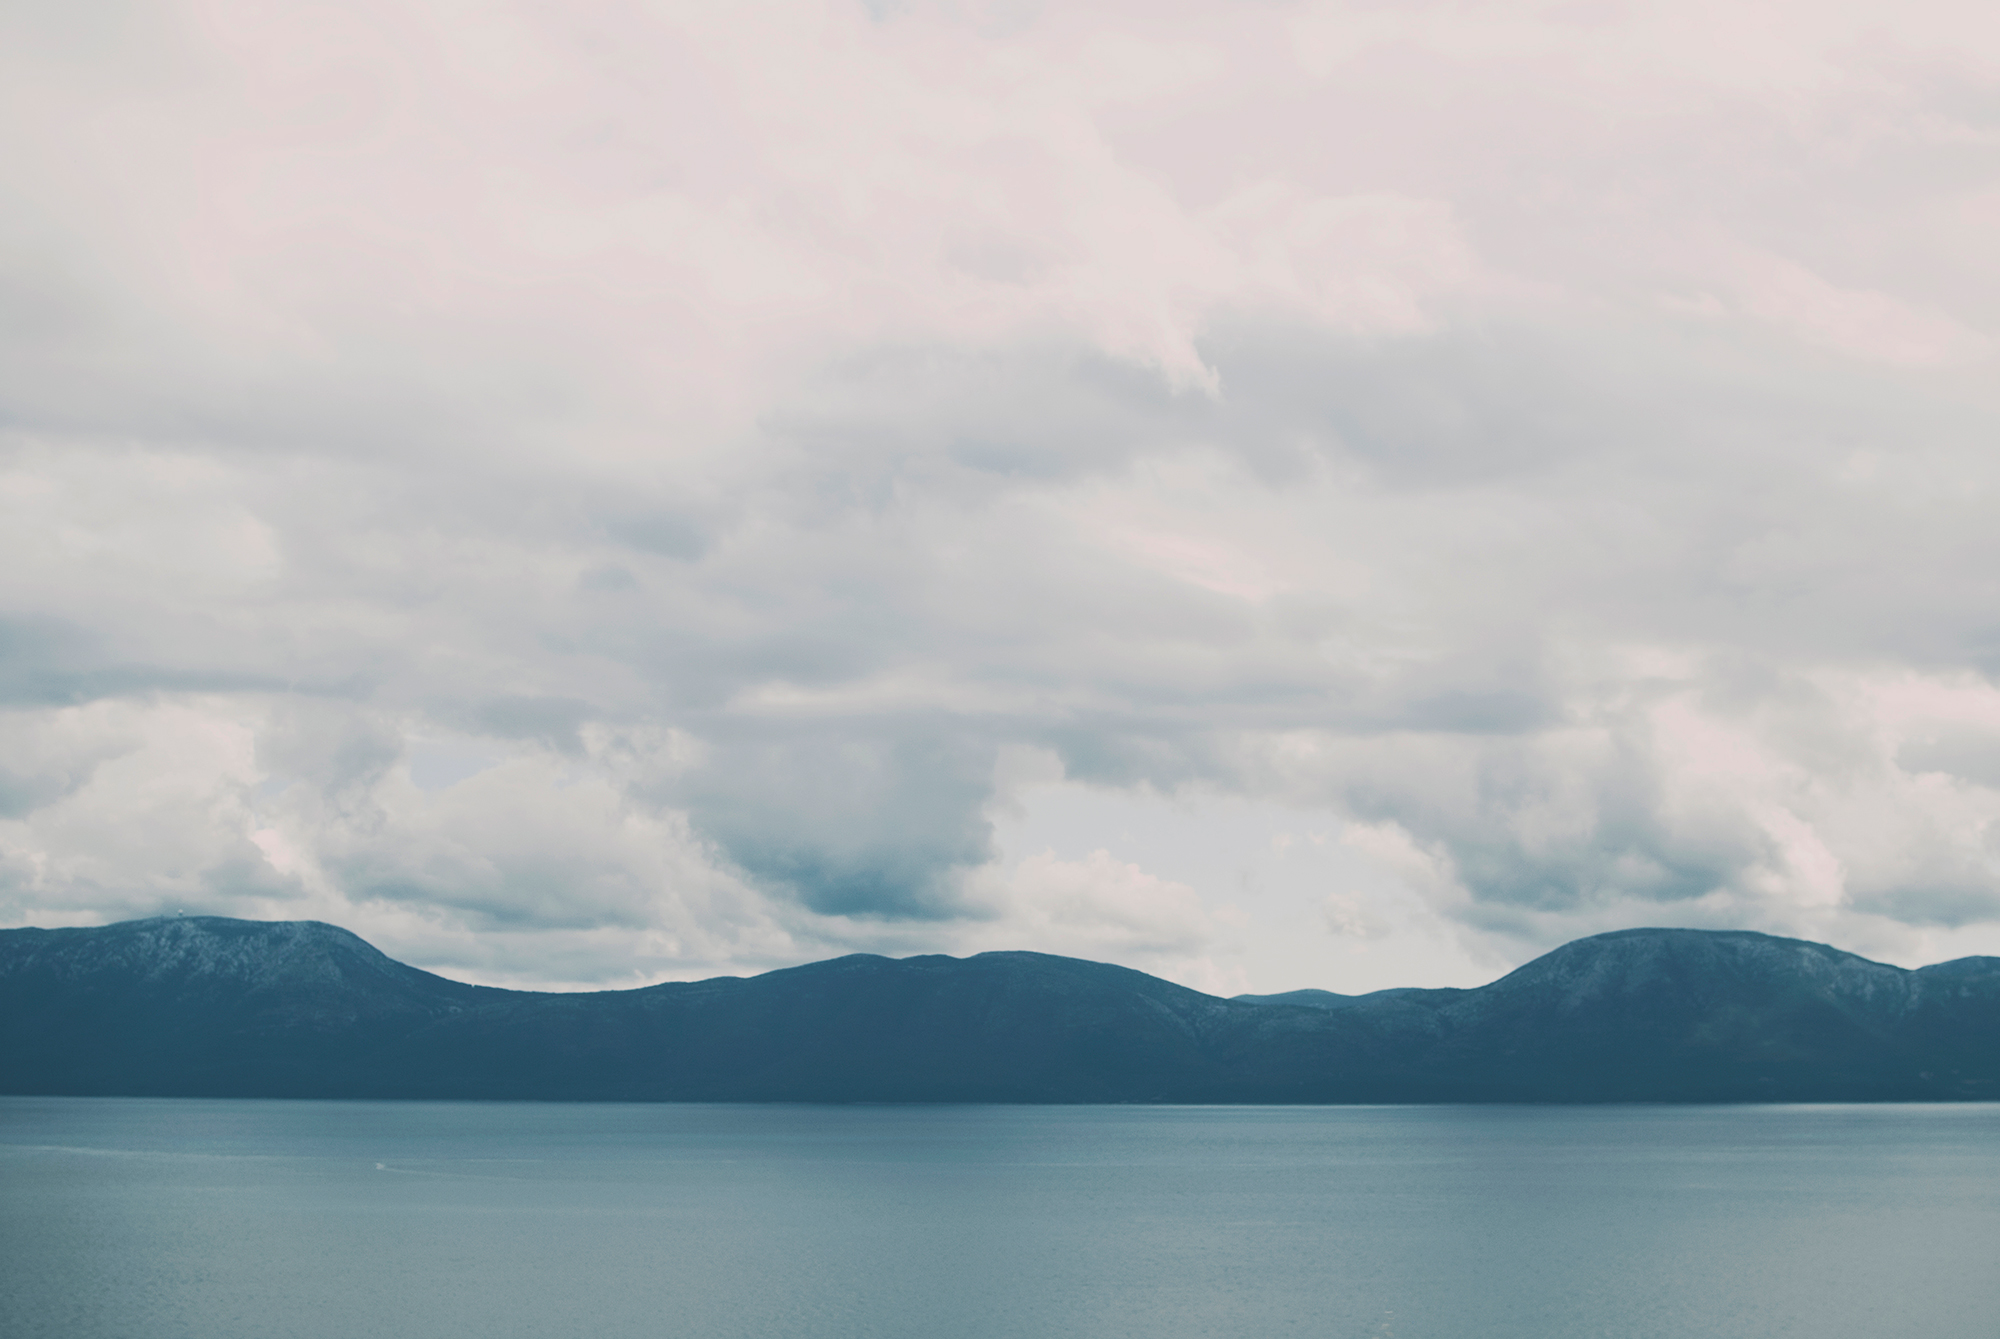 Somewhere Along Croatian Coast, 2014